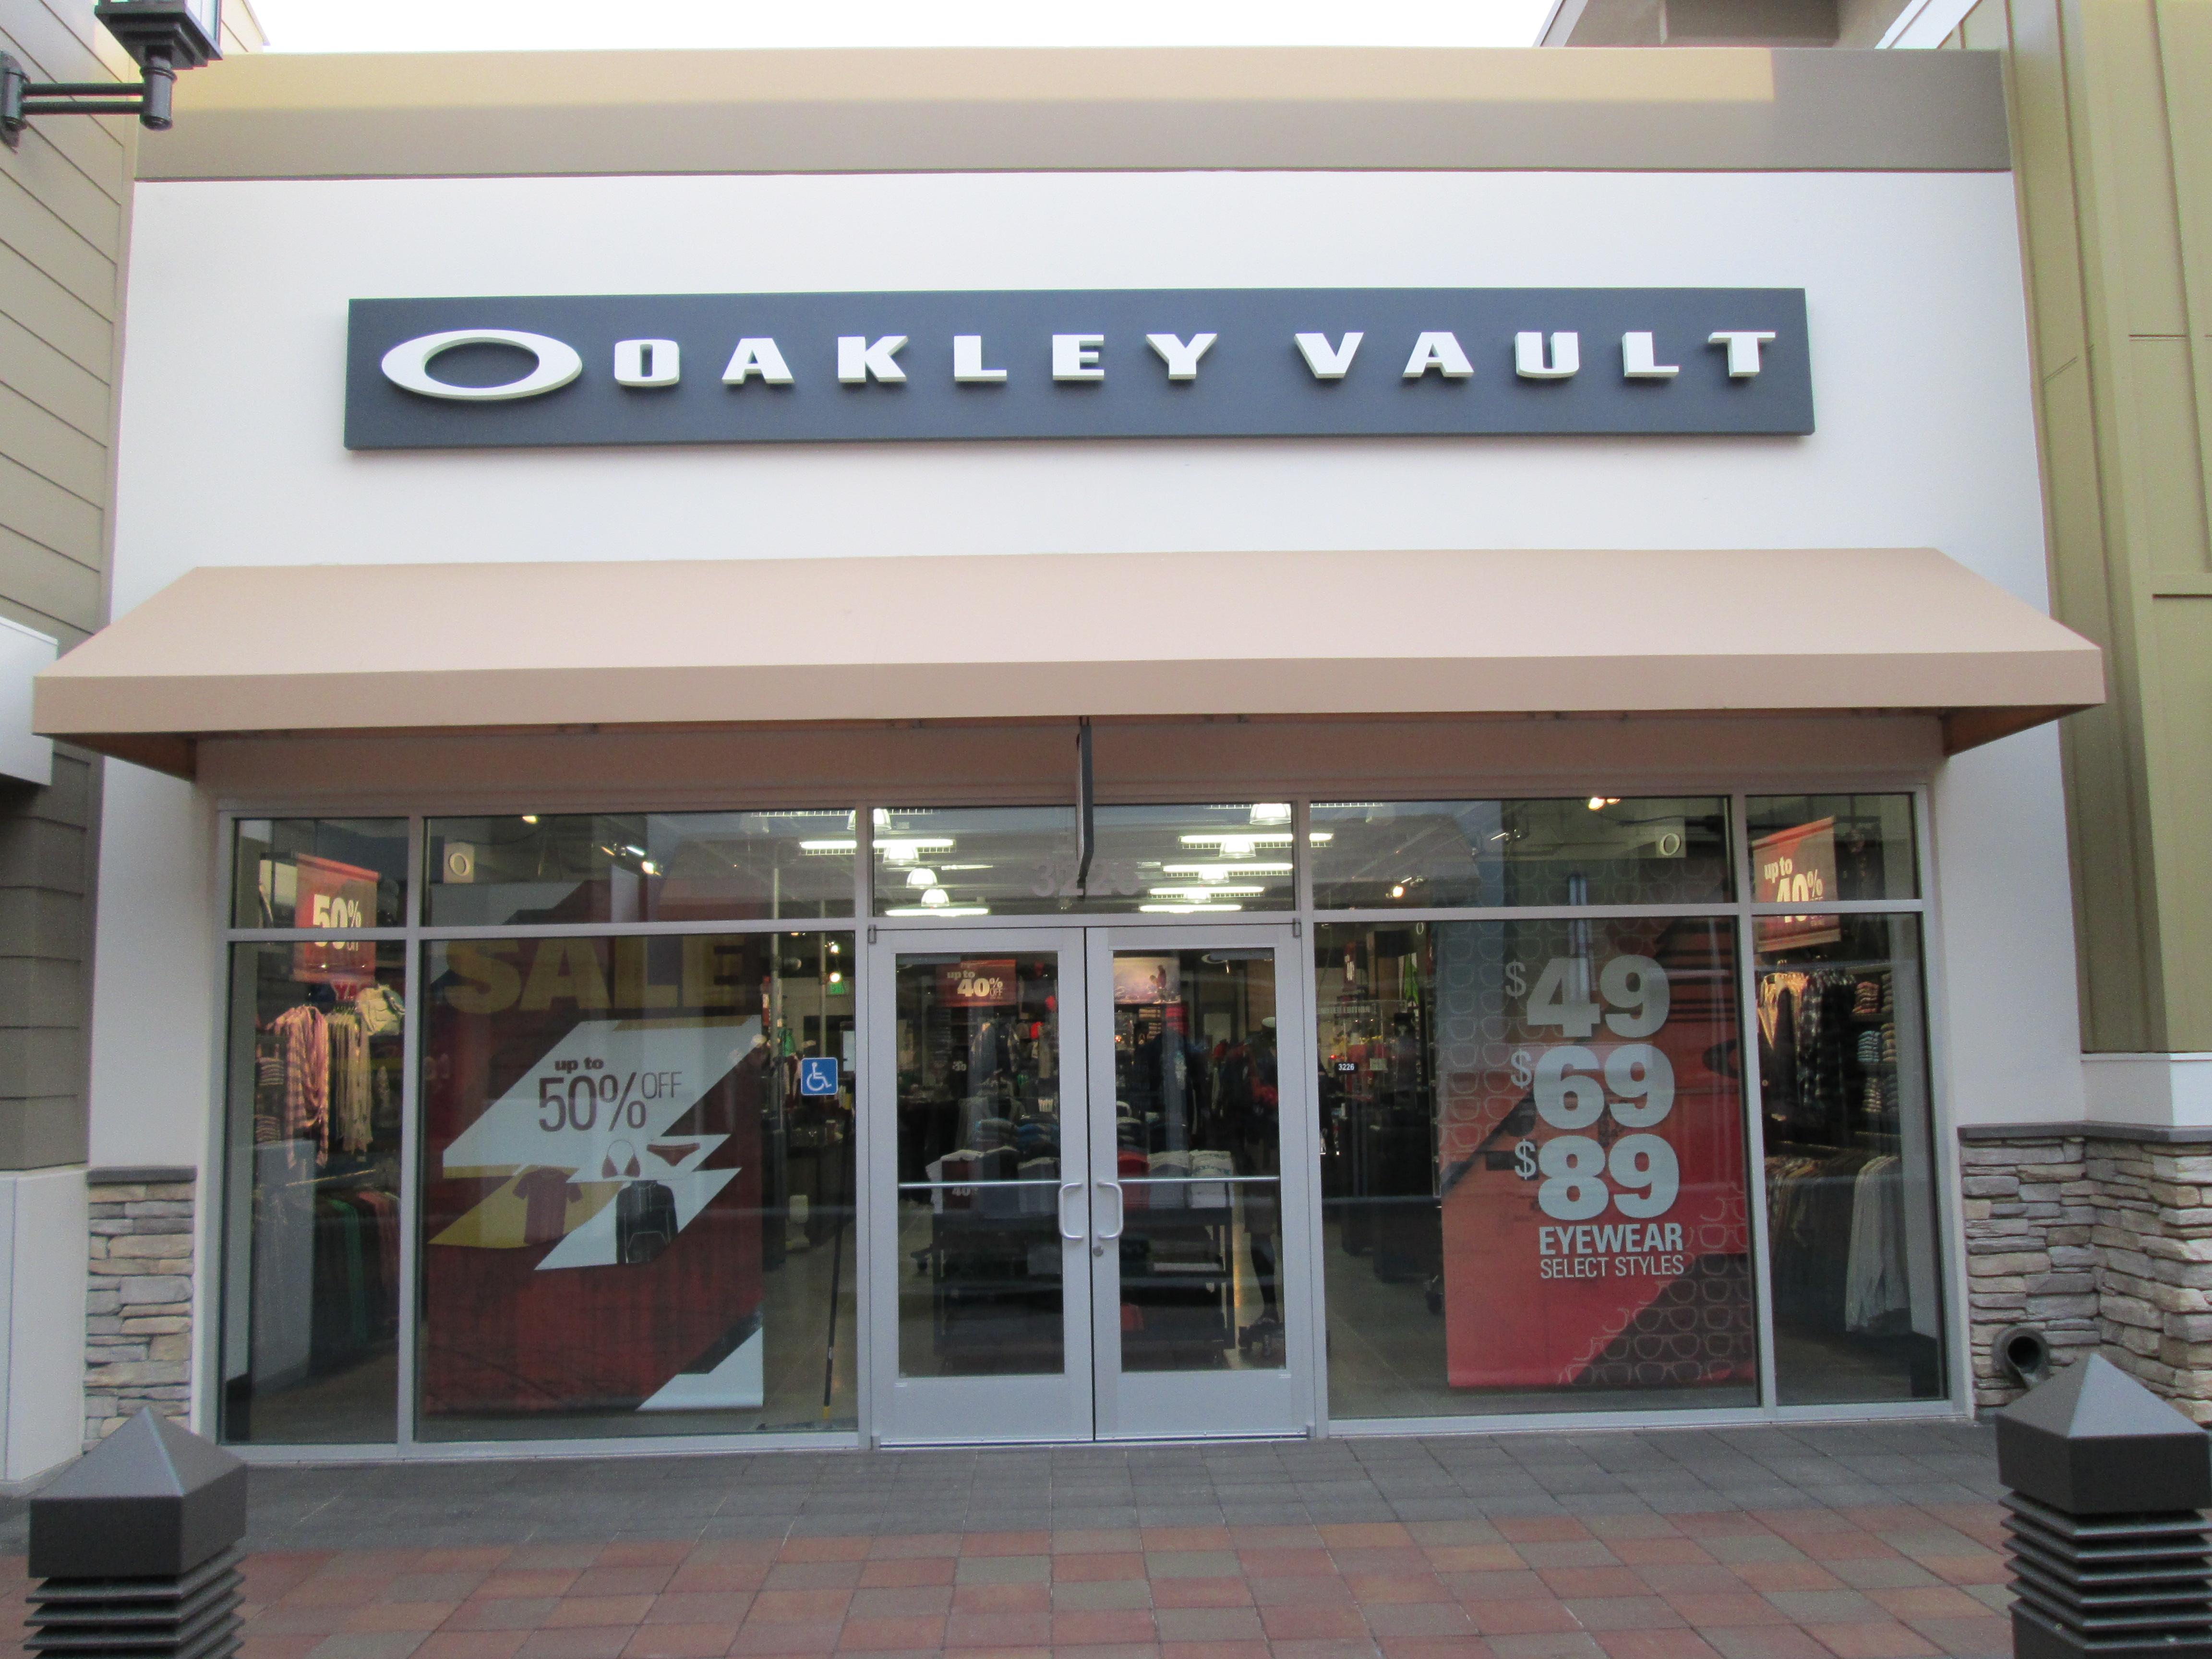 e0aa89c3b27 Oakley Vault San Francisco « Heritage Malta